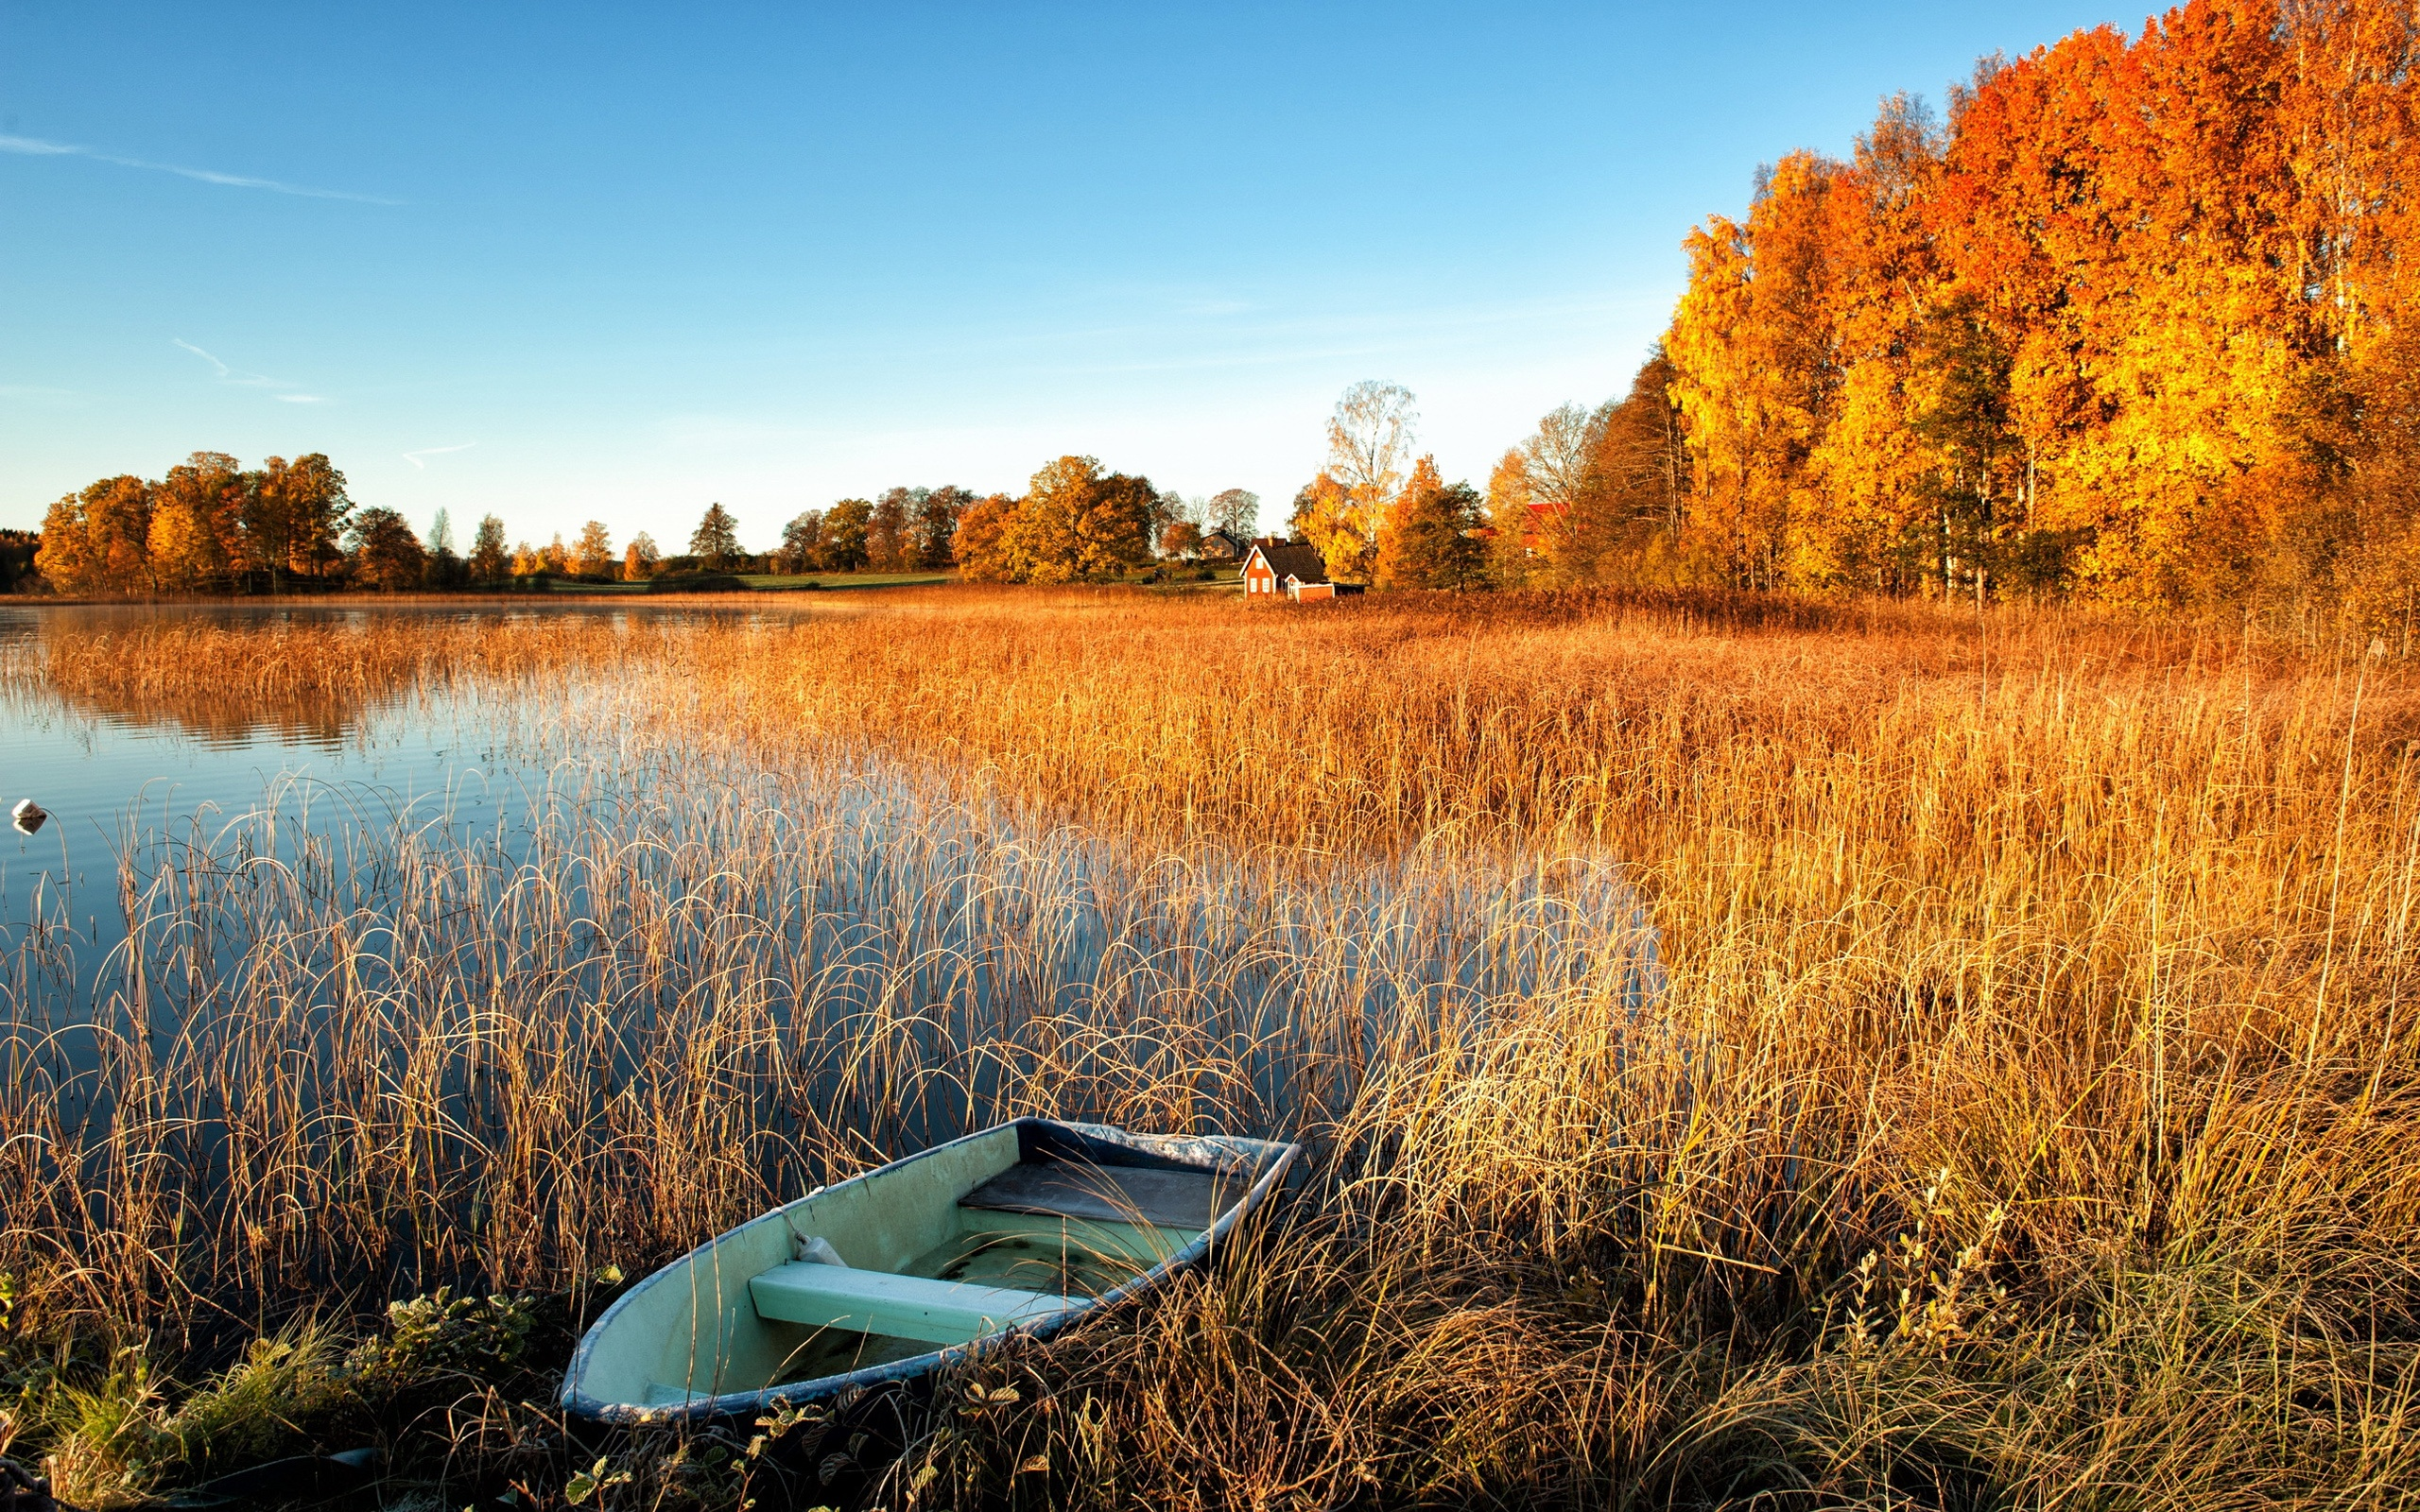 Wallpaper Autumn Scenery Lake Water Grass Boat Trees